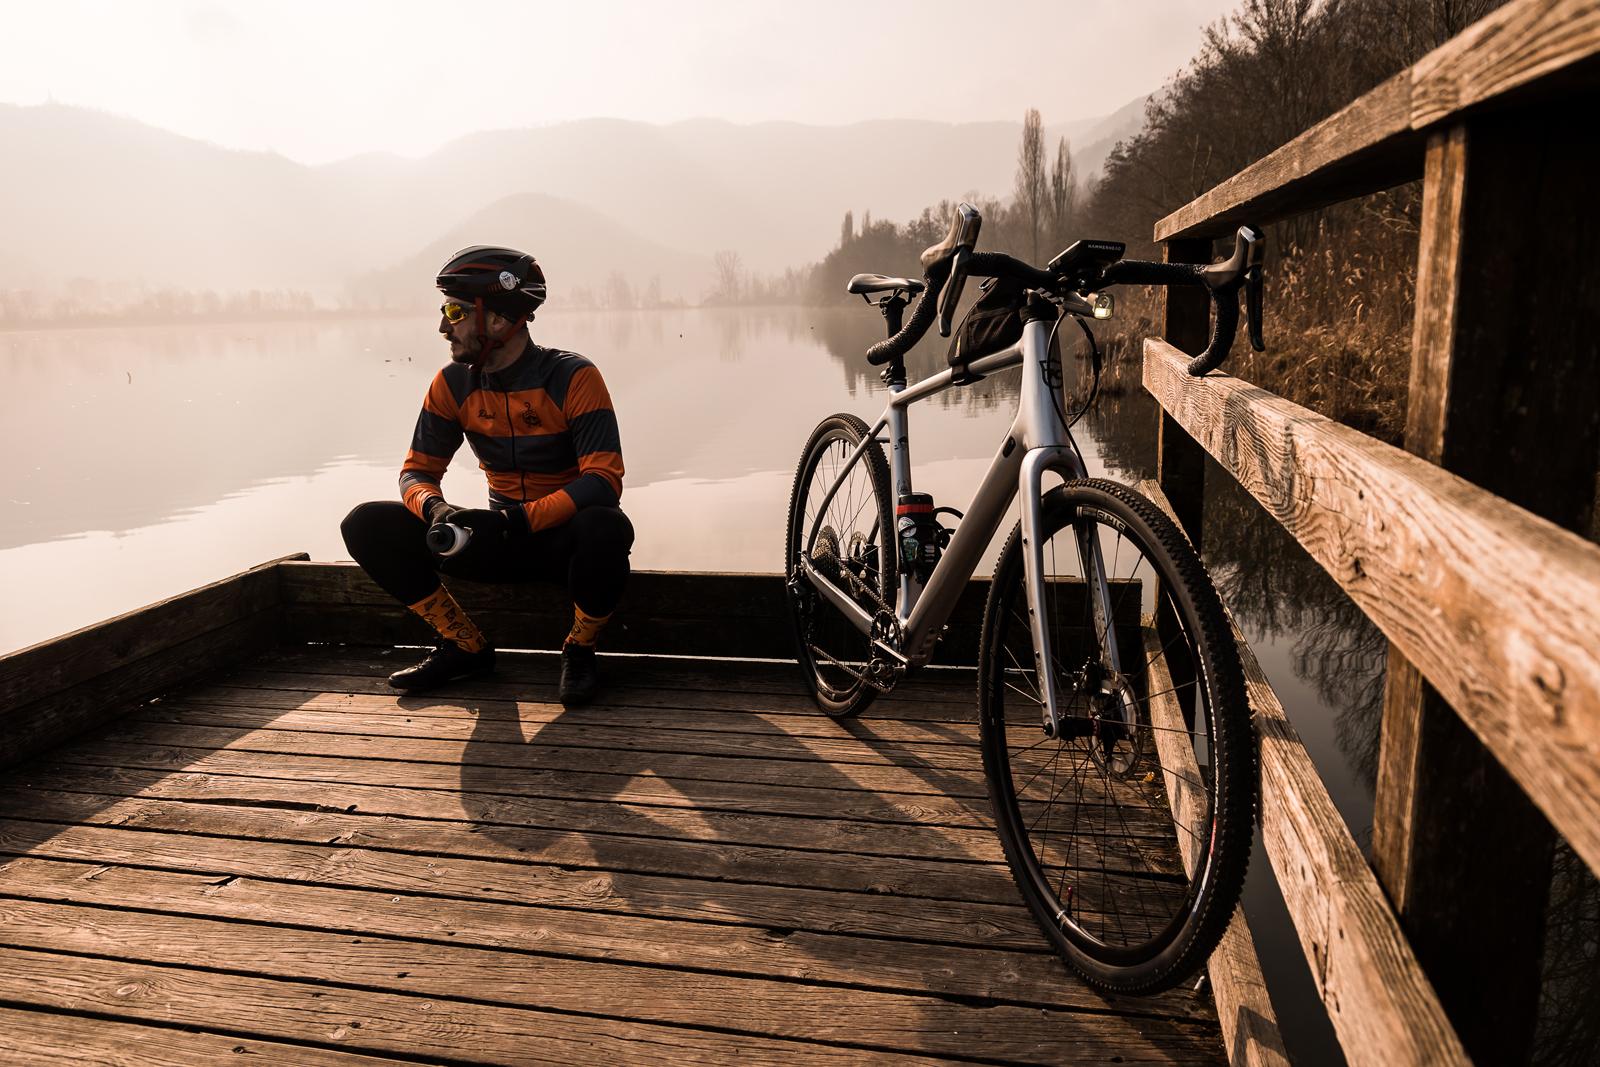 New_Bike_Day_026